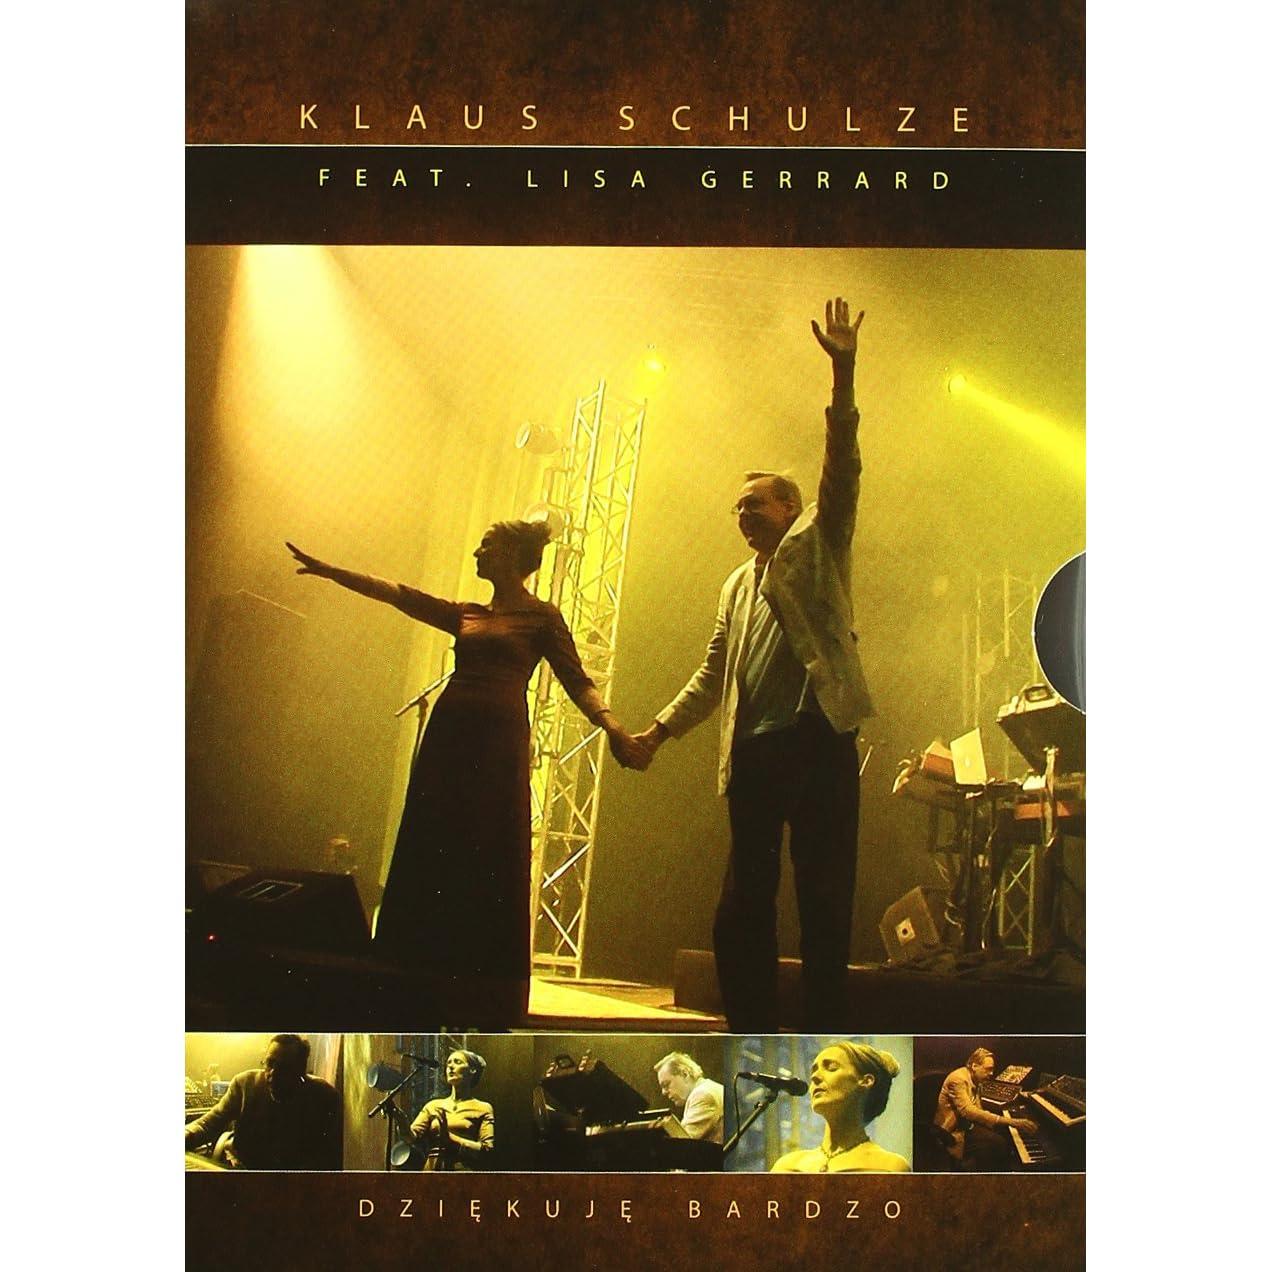 Music DVD Review: Klaus Schulze featuring Lisa Gerrard - Dziekuje Bardzo